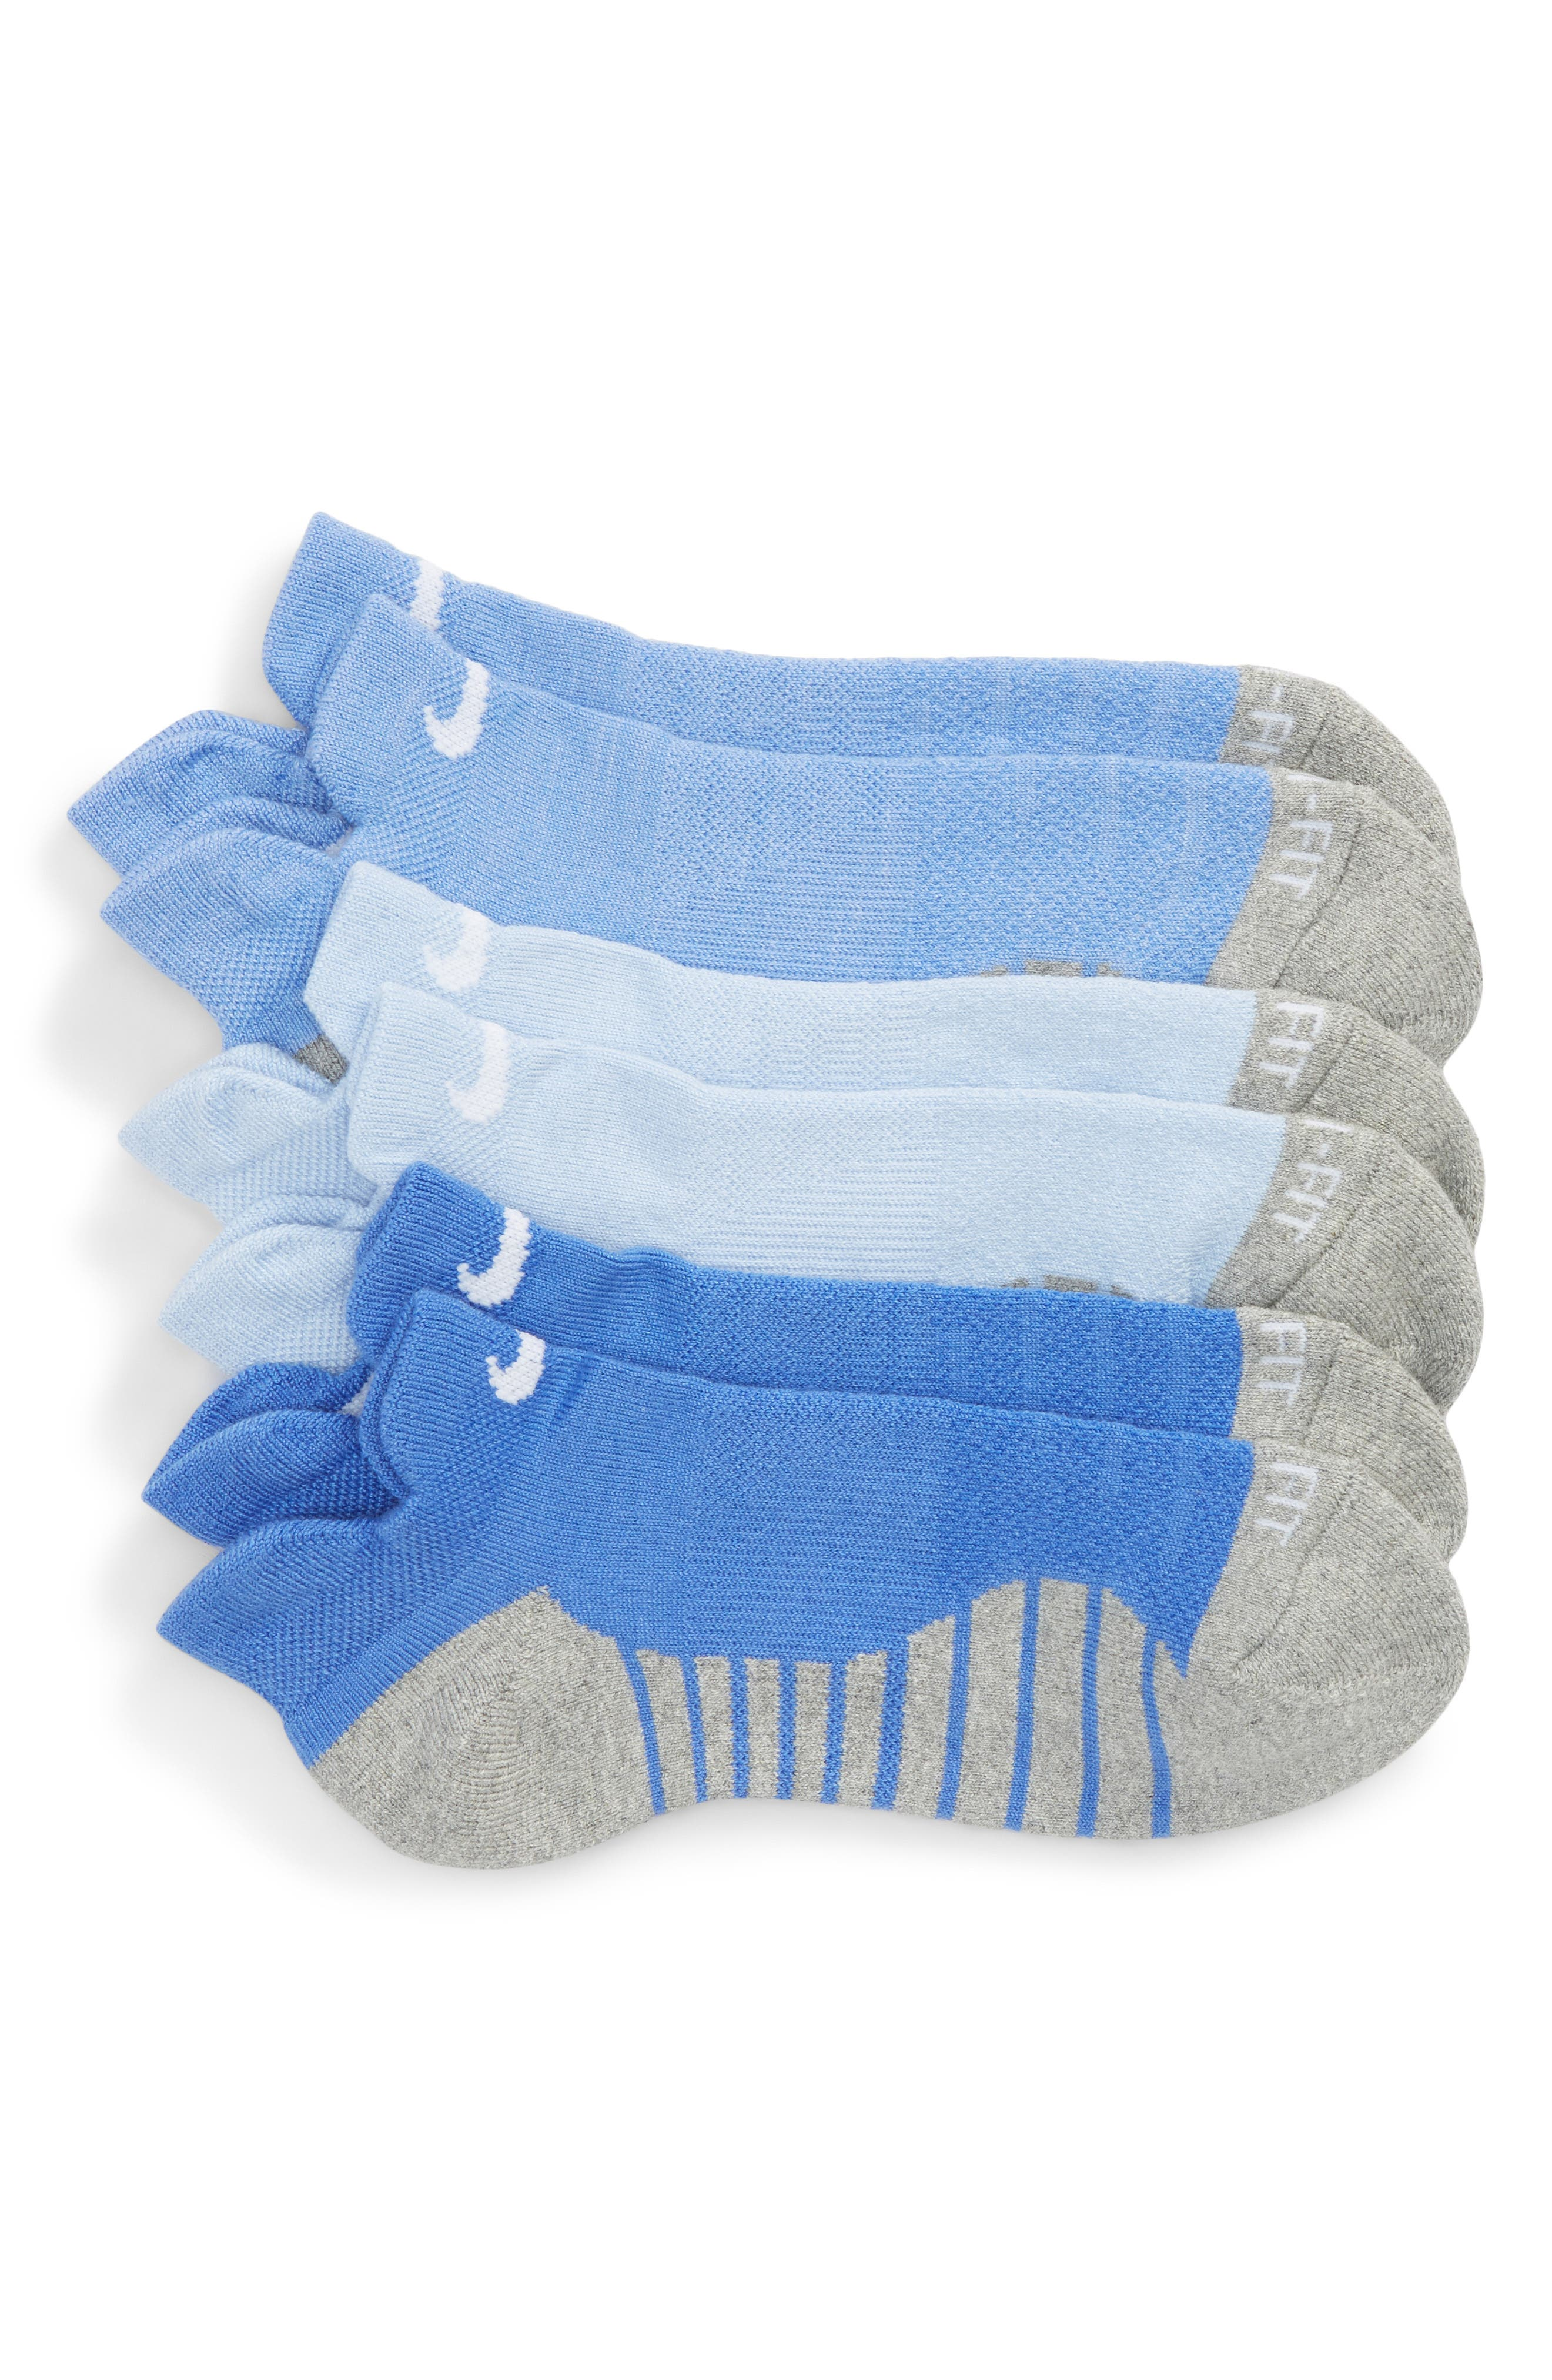 Nike Dry 3-Pack Cushioned Low Cut Socks